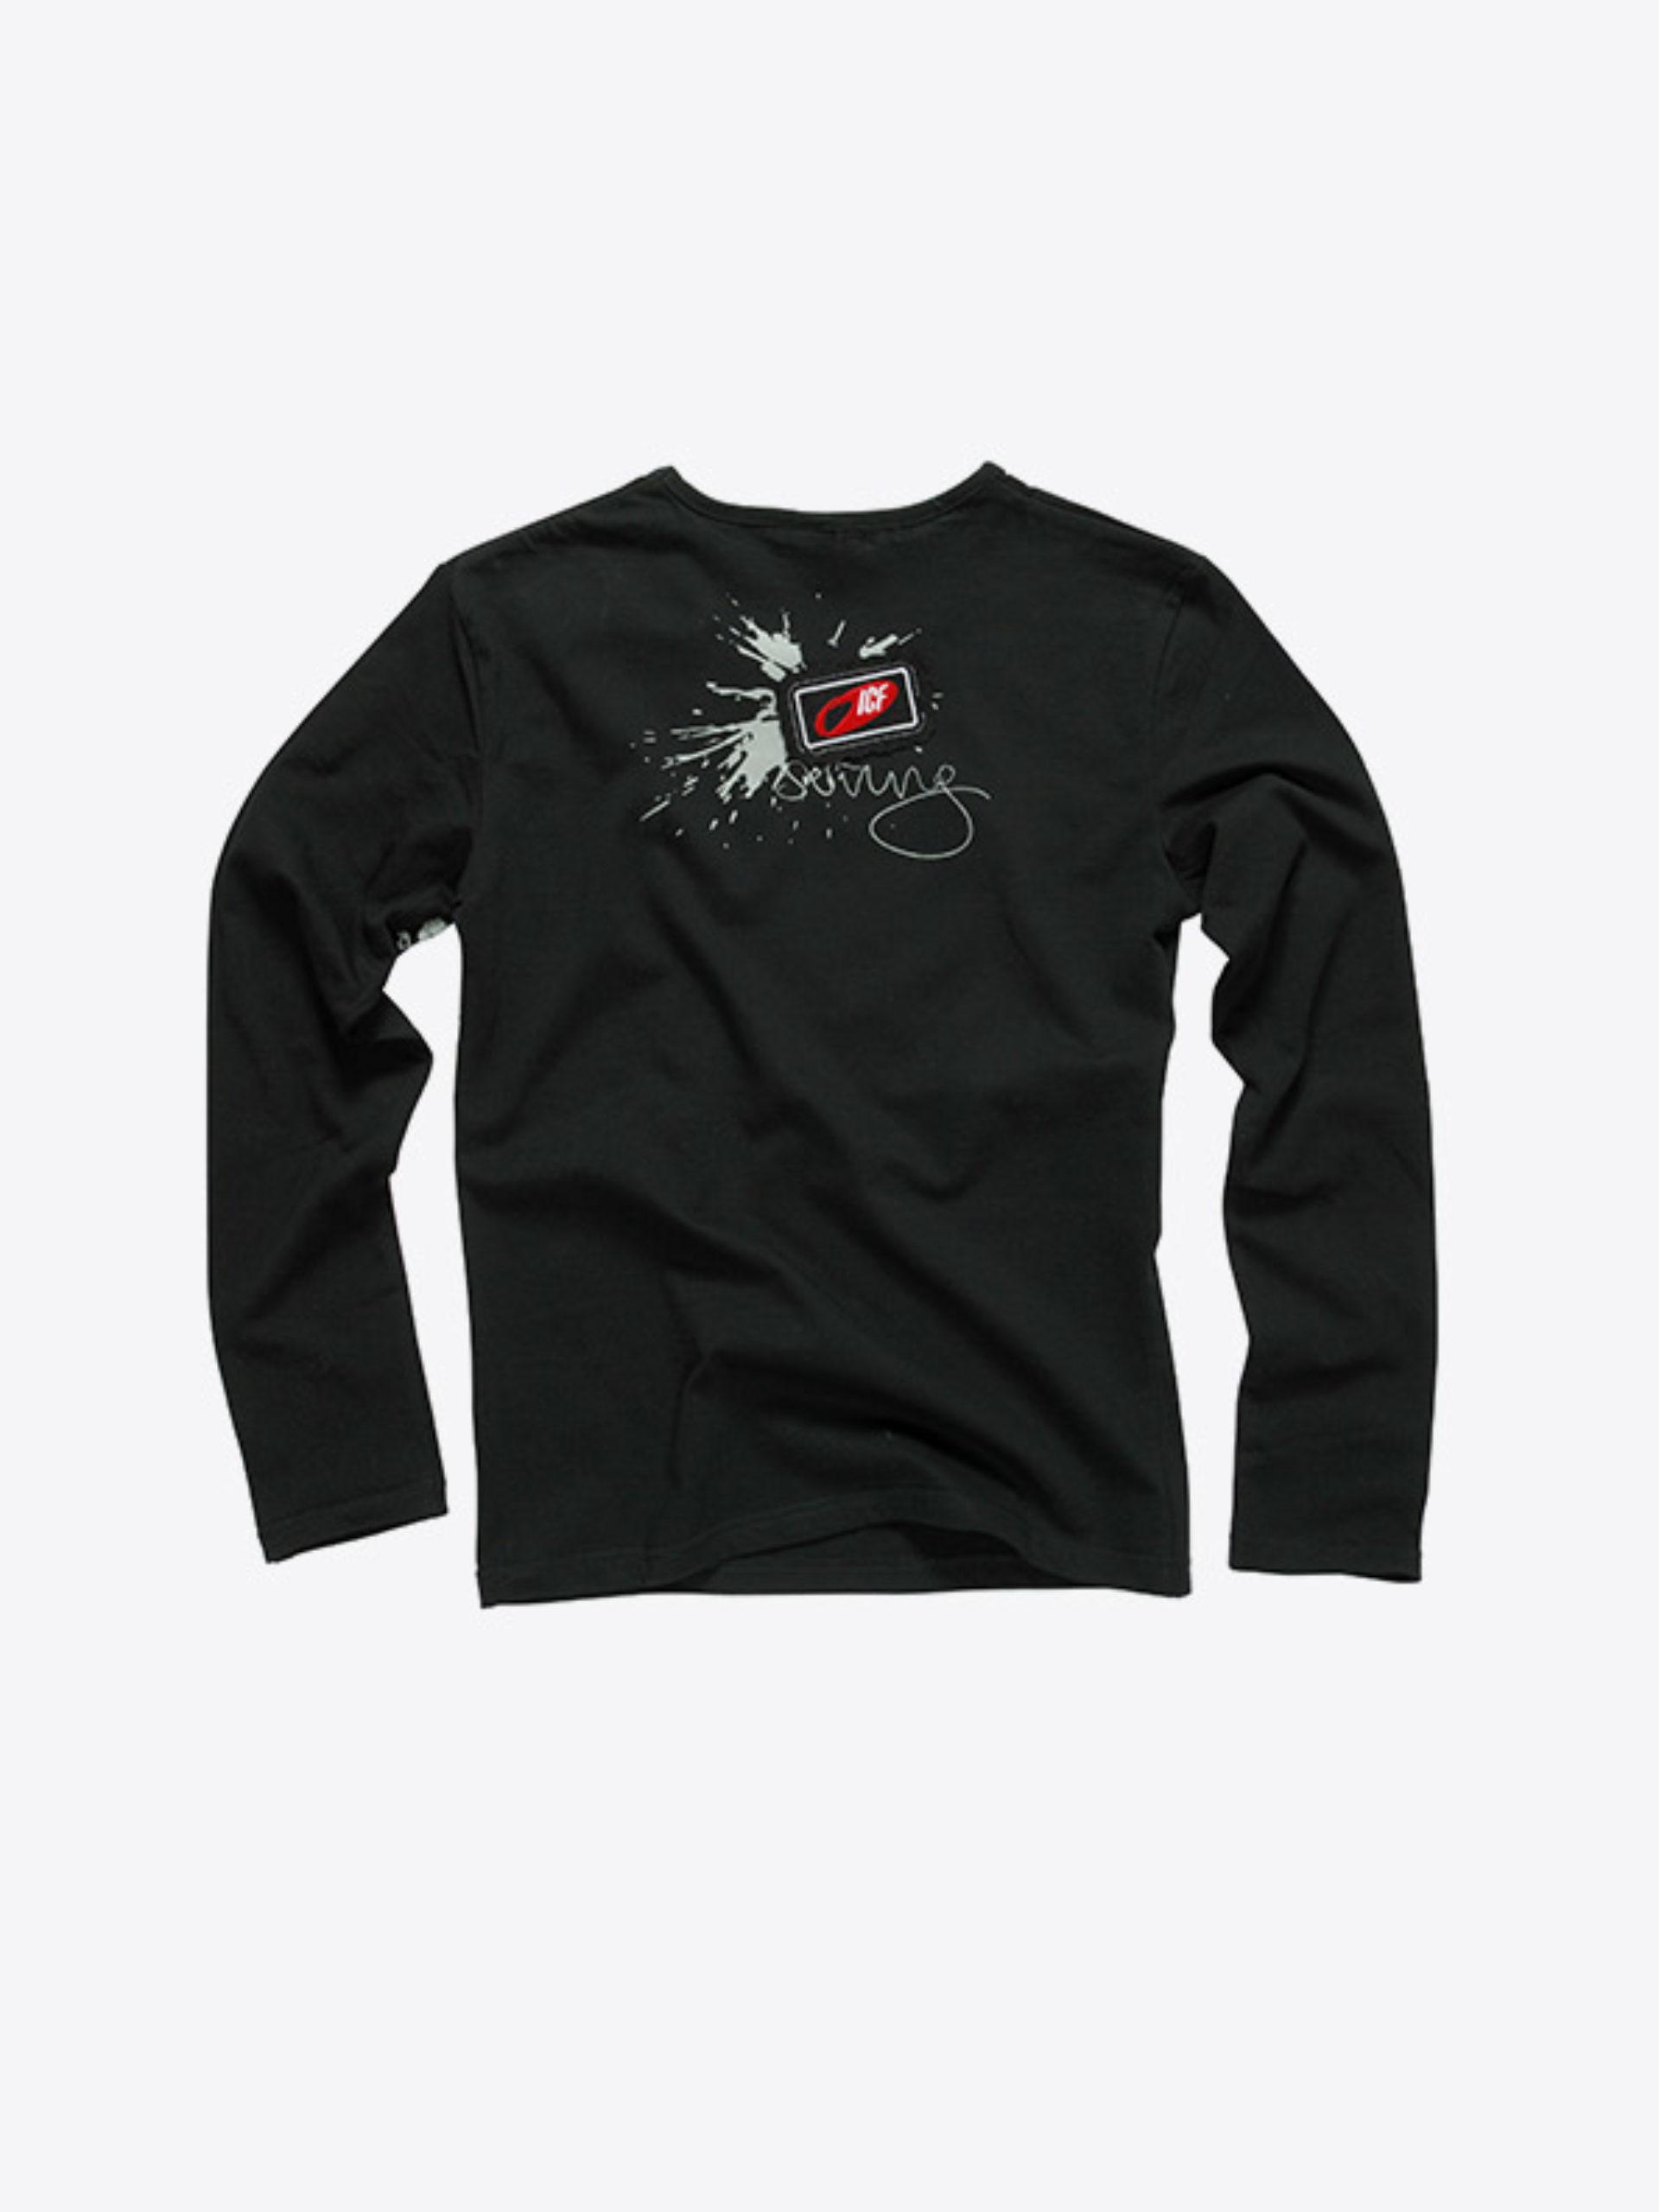 Damen T Shirt Langarm Mit Firmen Logo Bedrucken